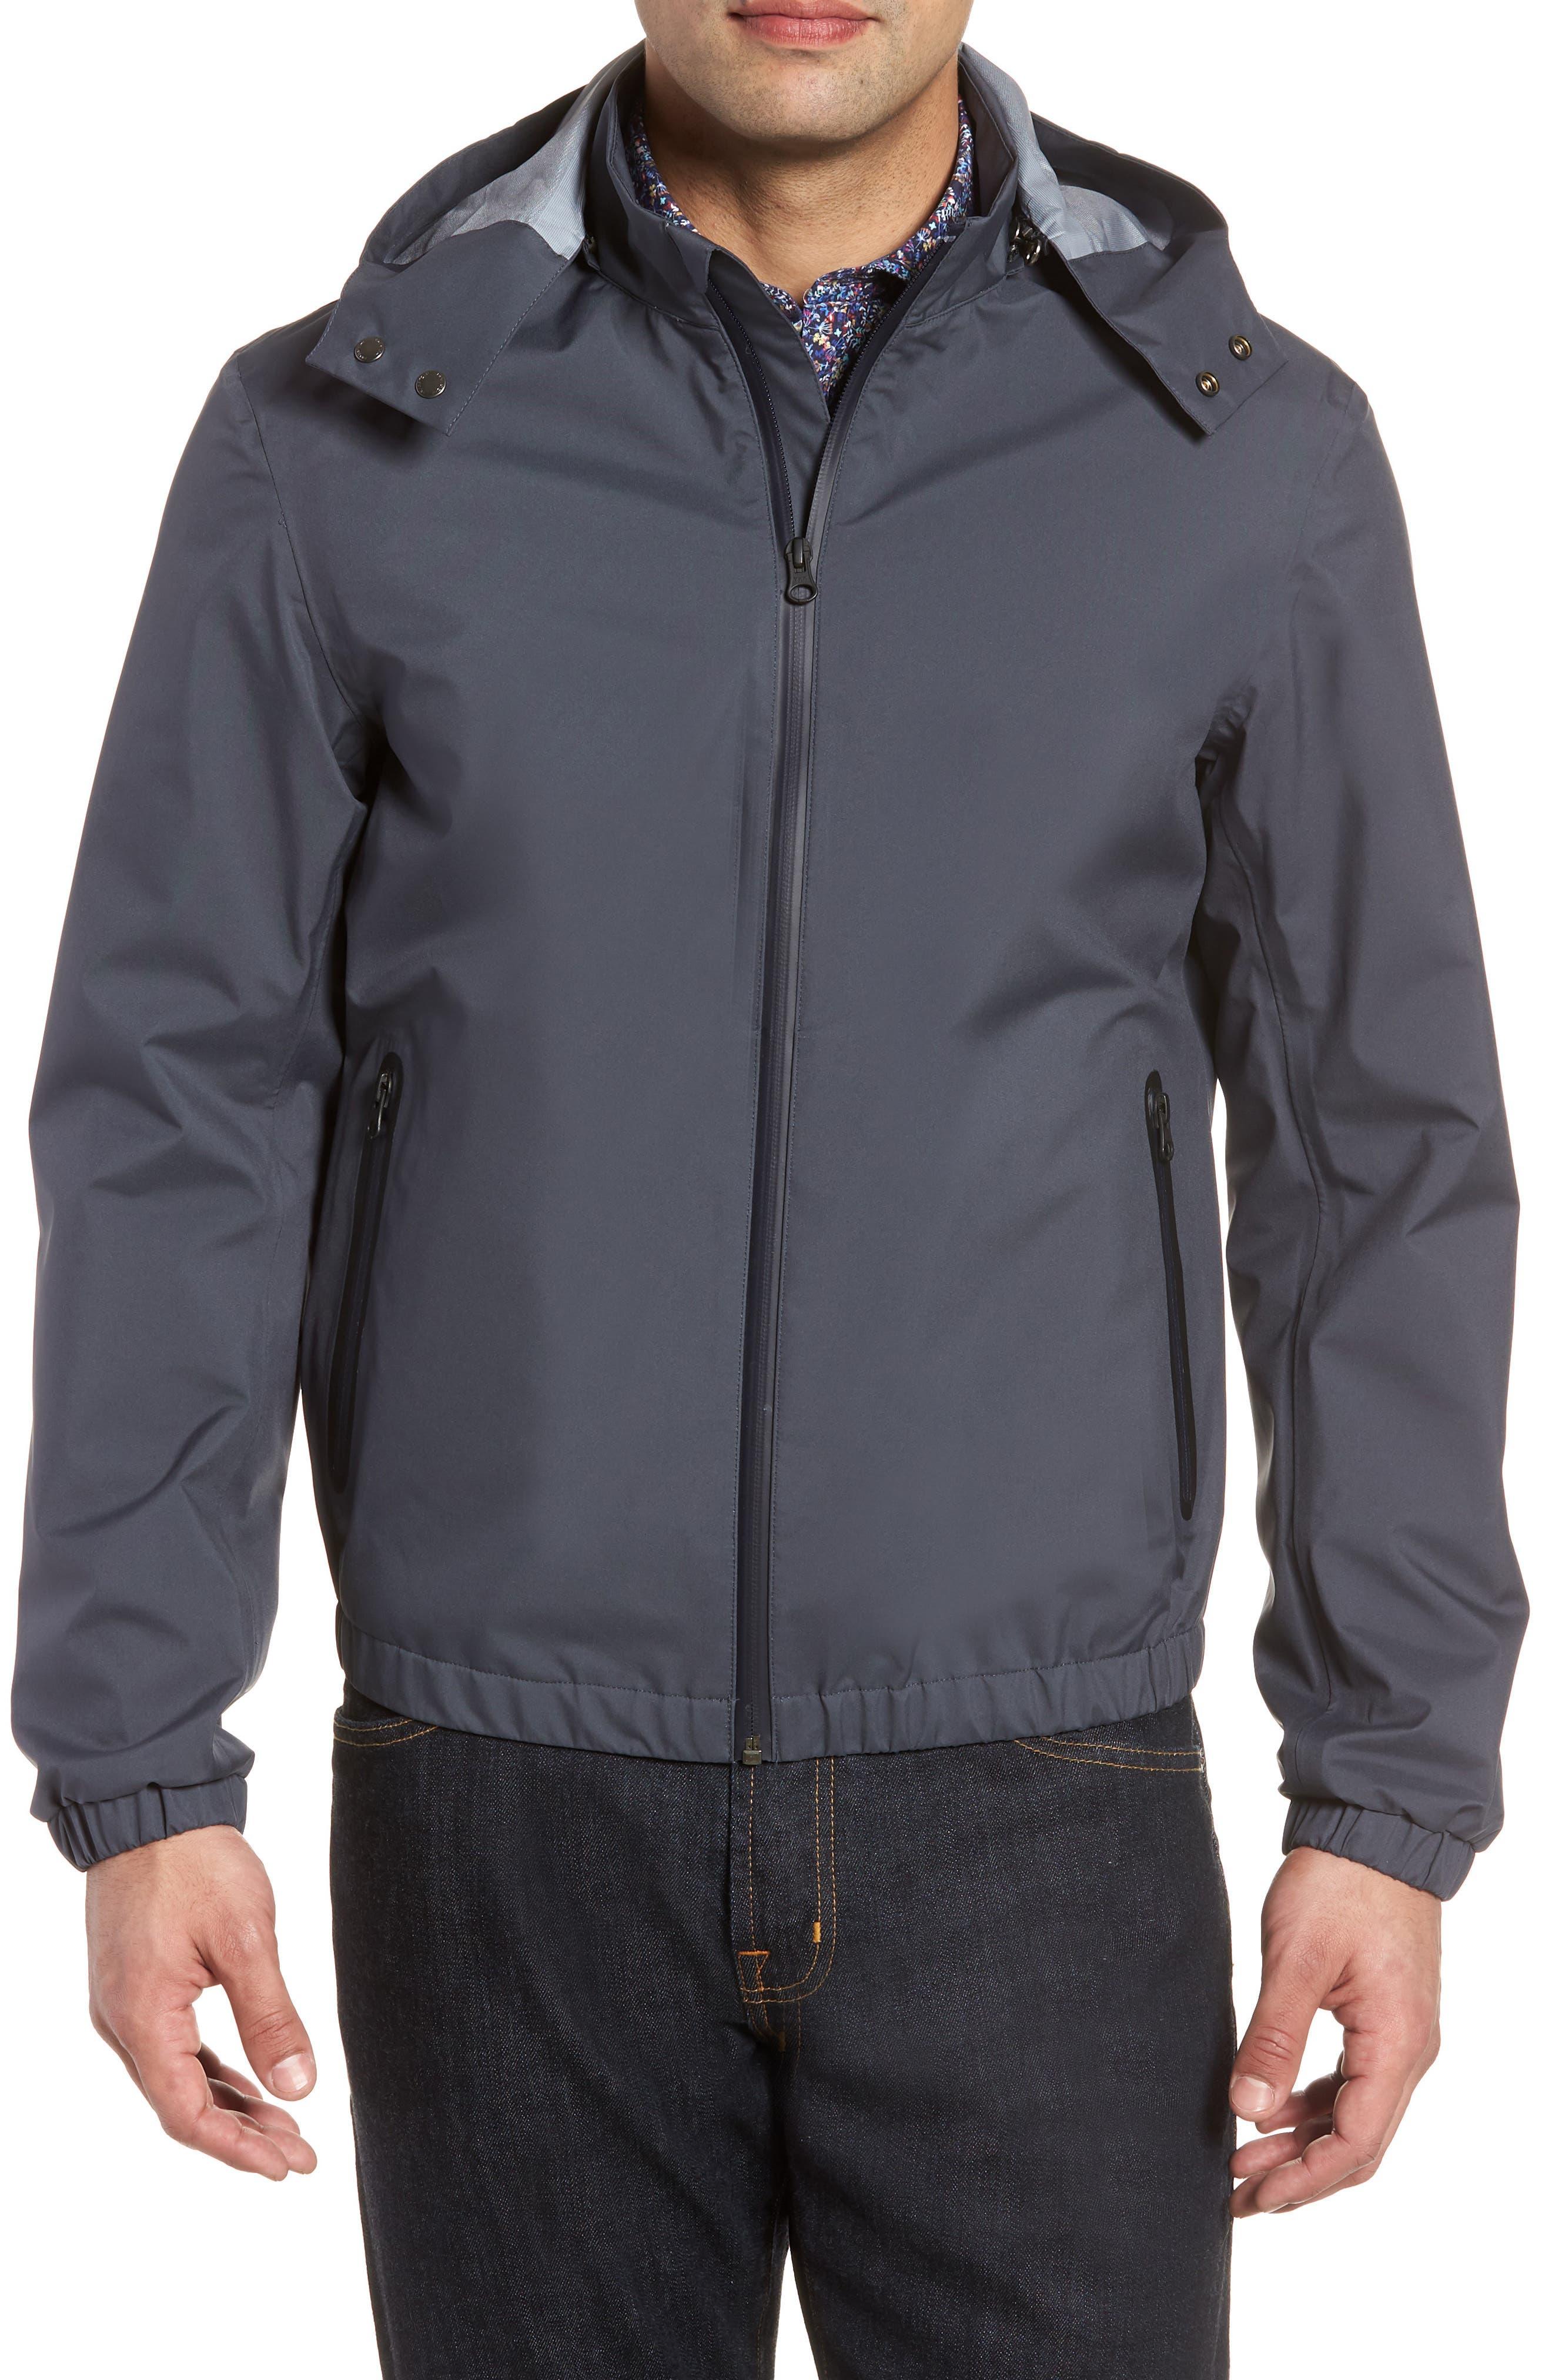 Regular Fit Jacket,                             Main thumbnail 1, color,                             Slate